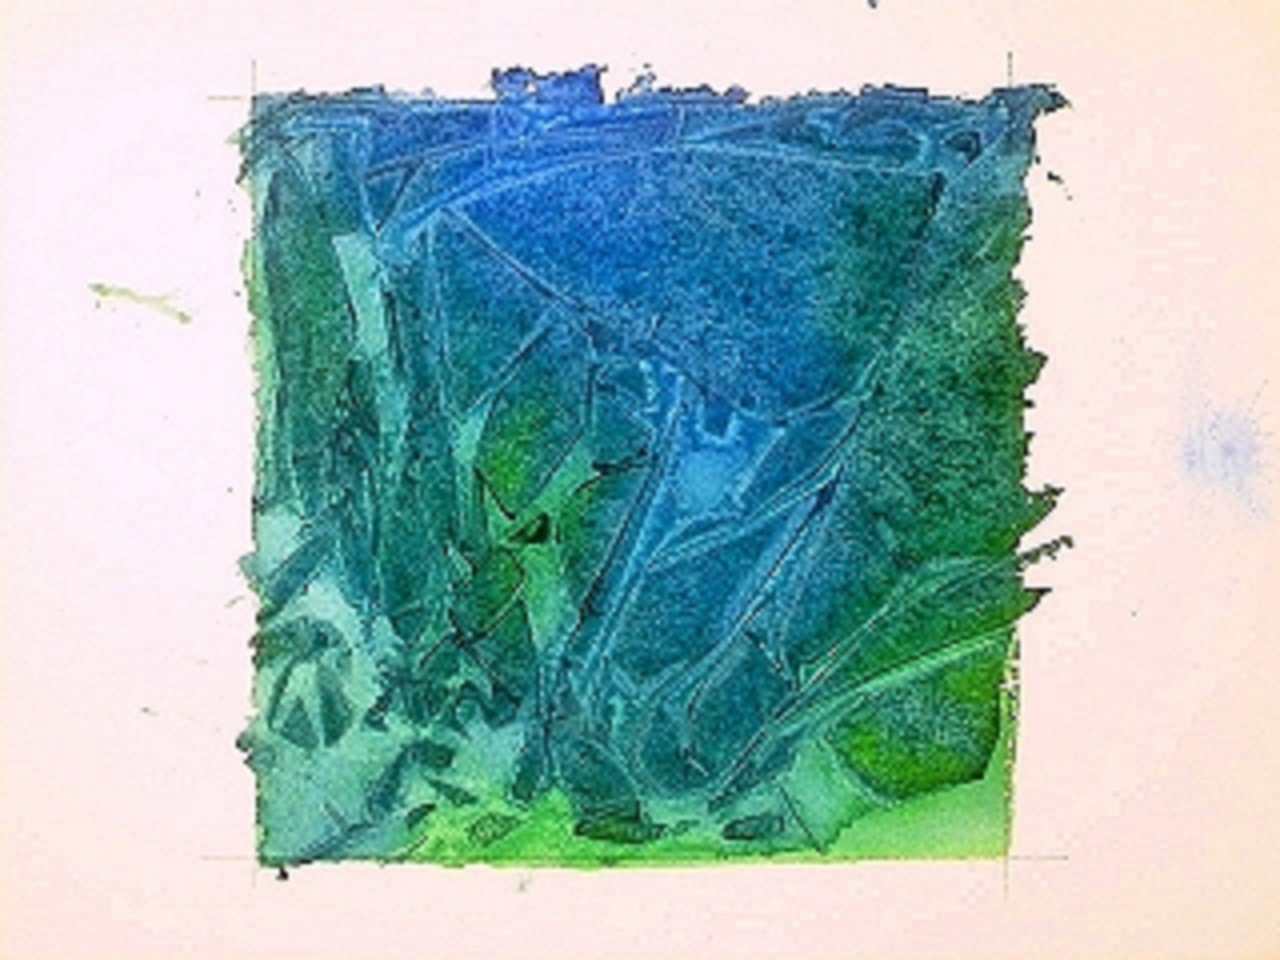 1280x960 Clever Watercolor Technique Using Plastic Wrap For Texture